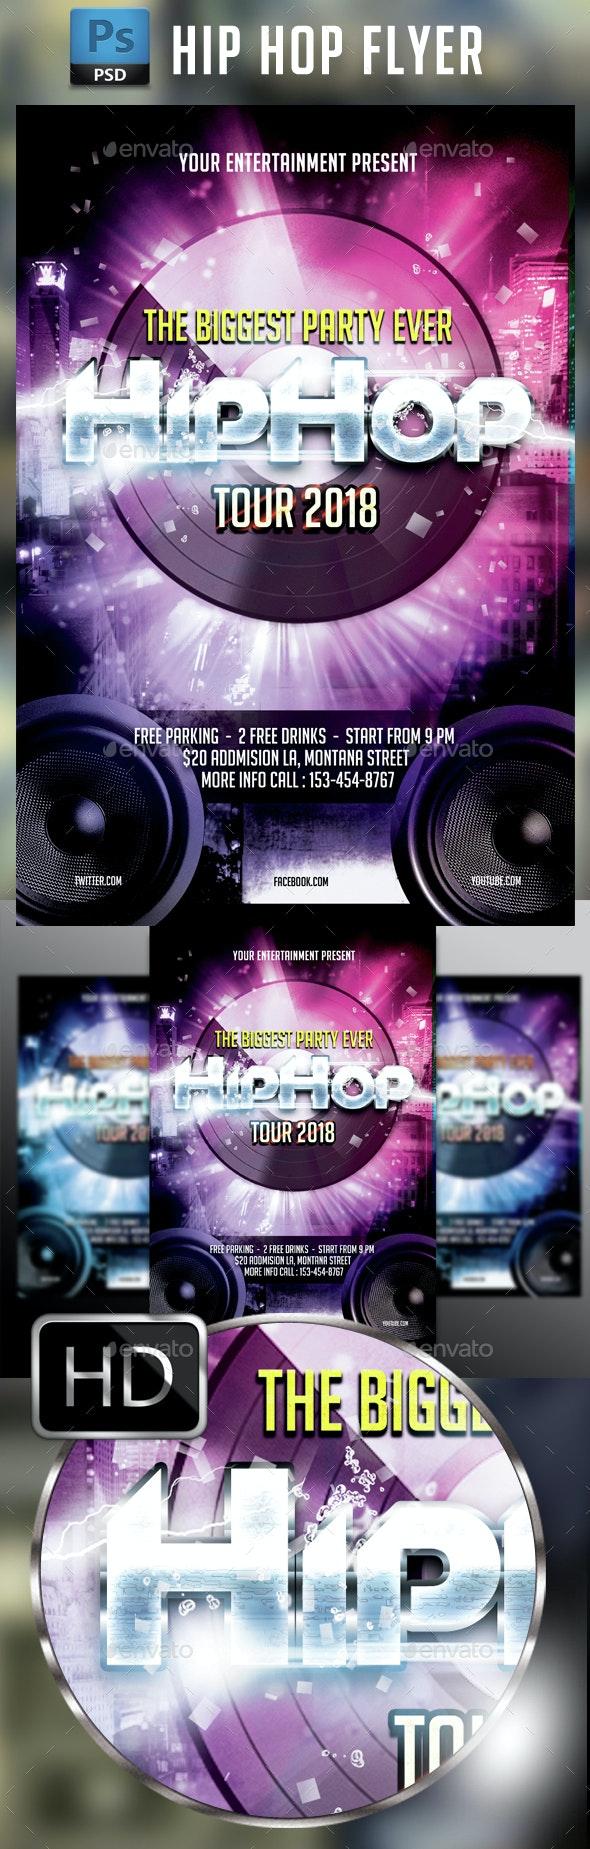 Hip Hop Flyer Template #3 - Events Flyers